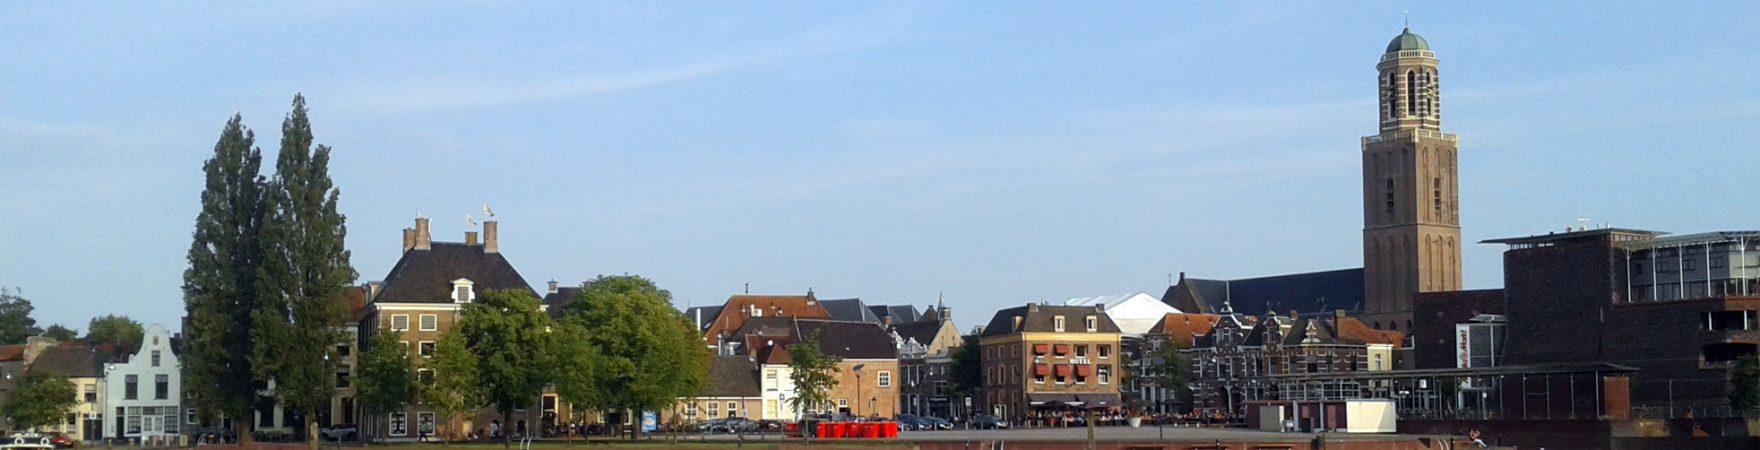 Waterhardheid in Zwolle